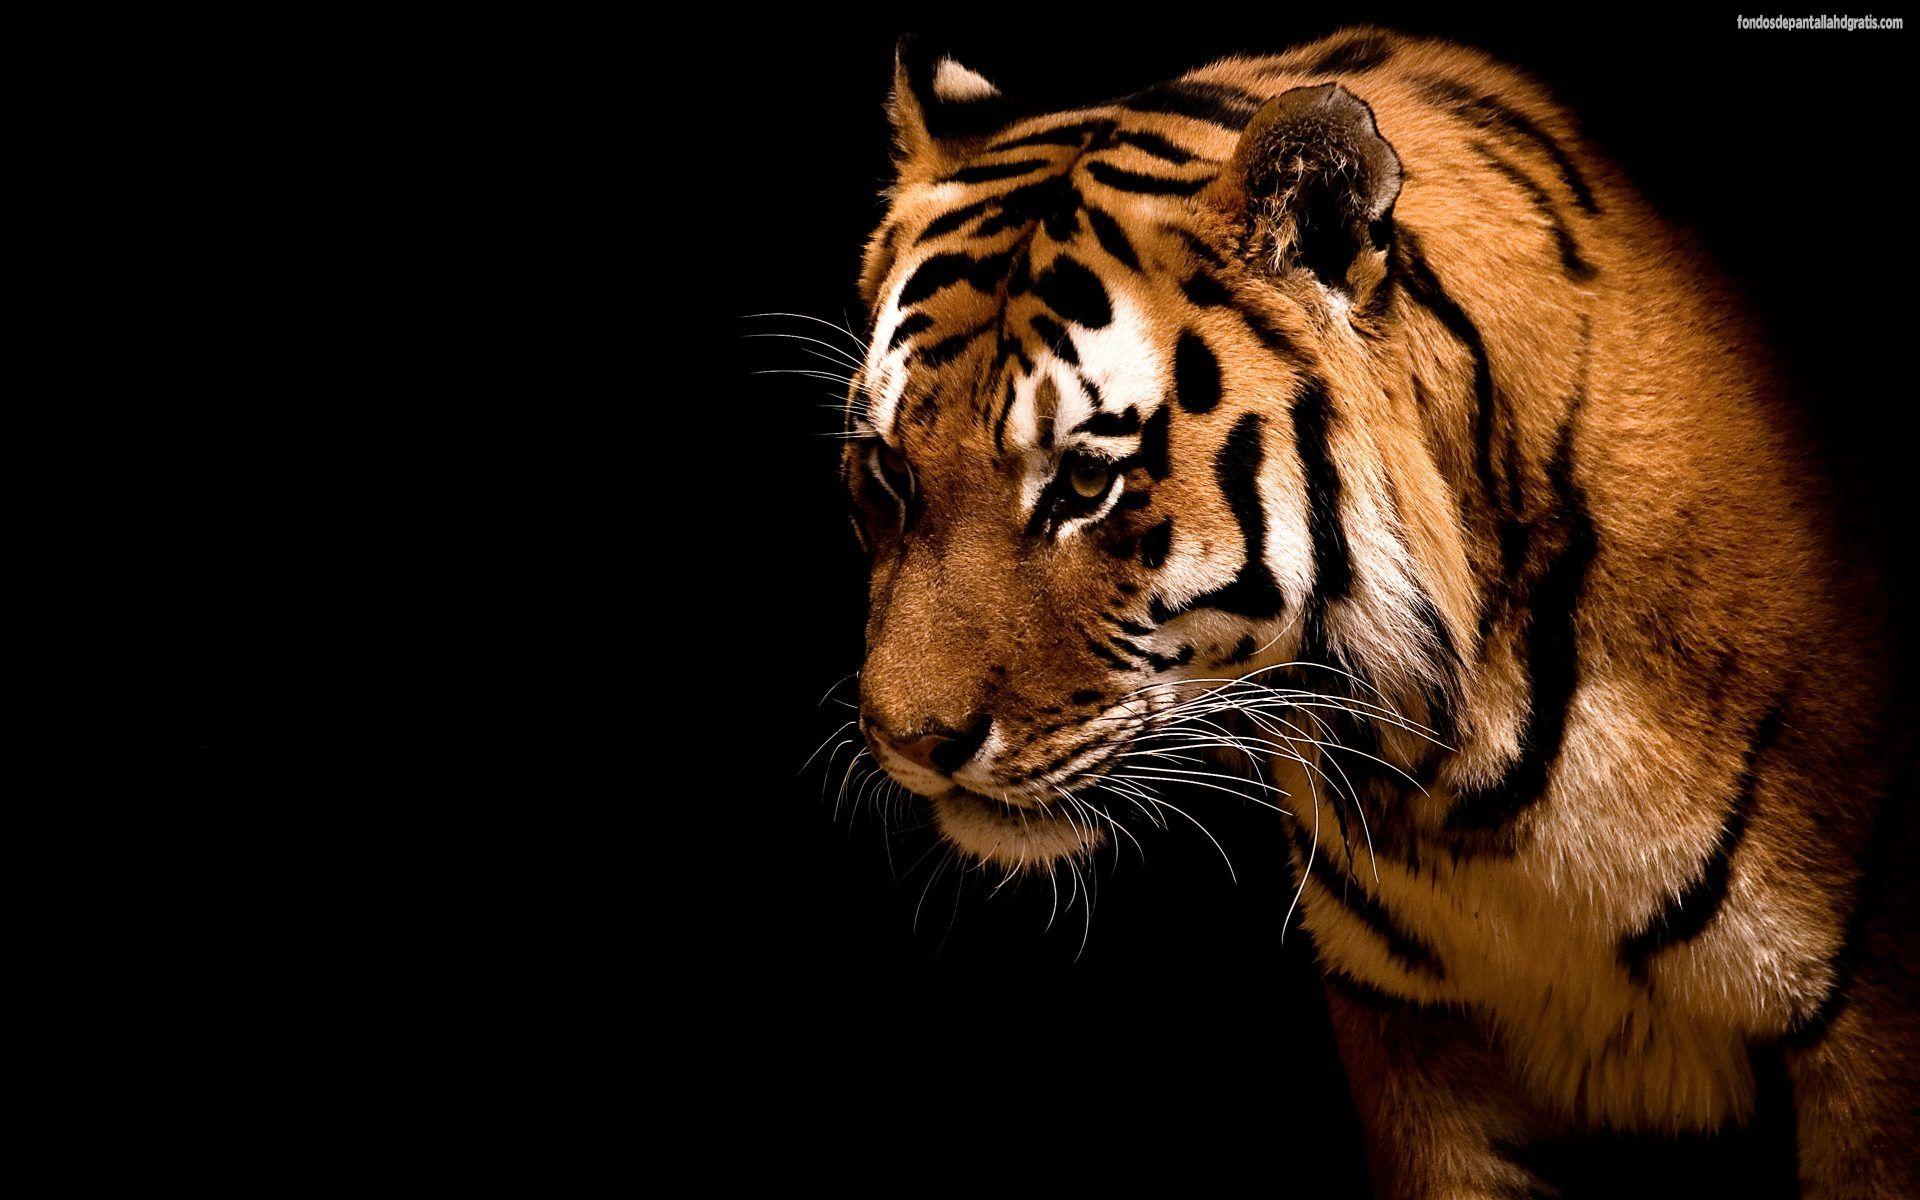 Animales Fondos De Escritorio Hd: Descargar Fondos De Pantalla 3D